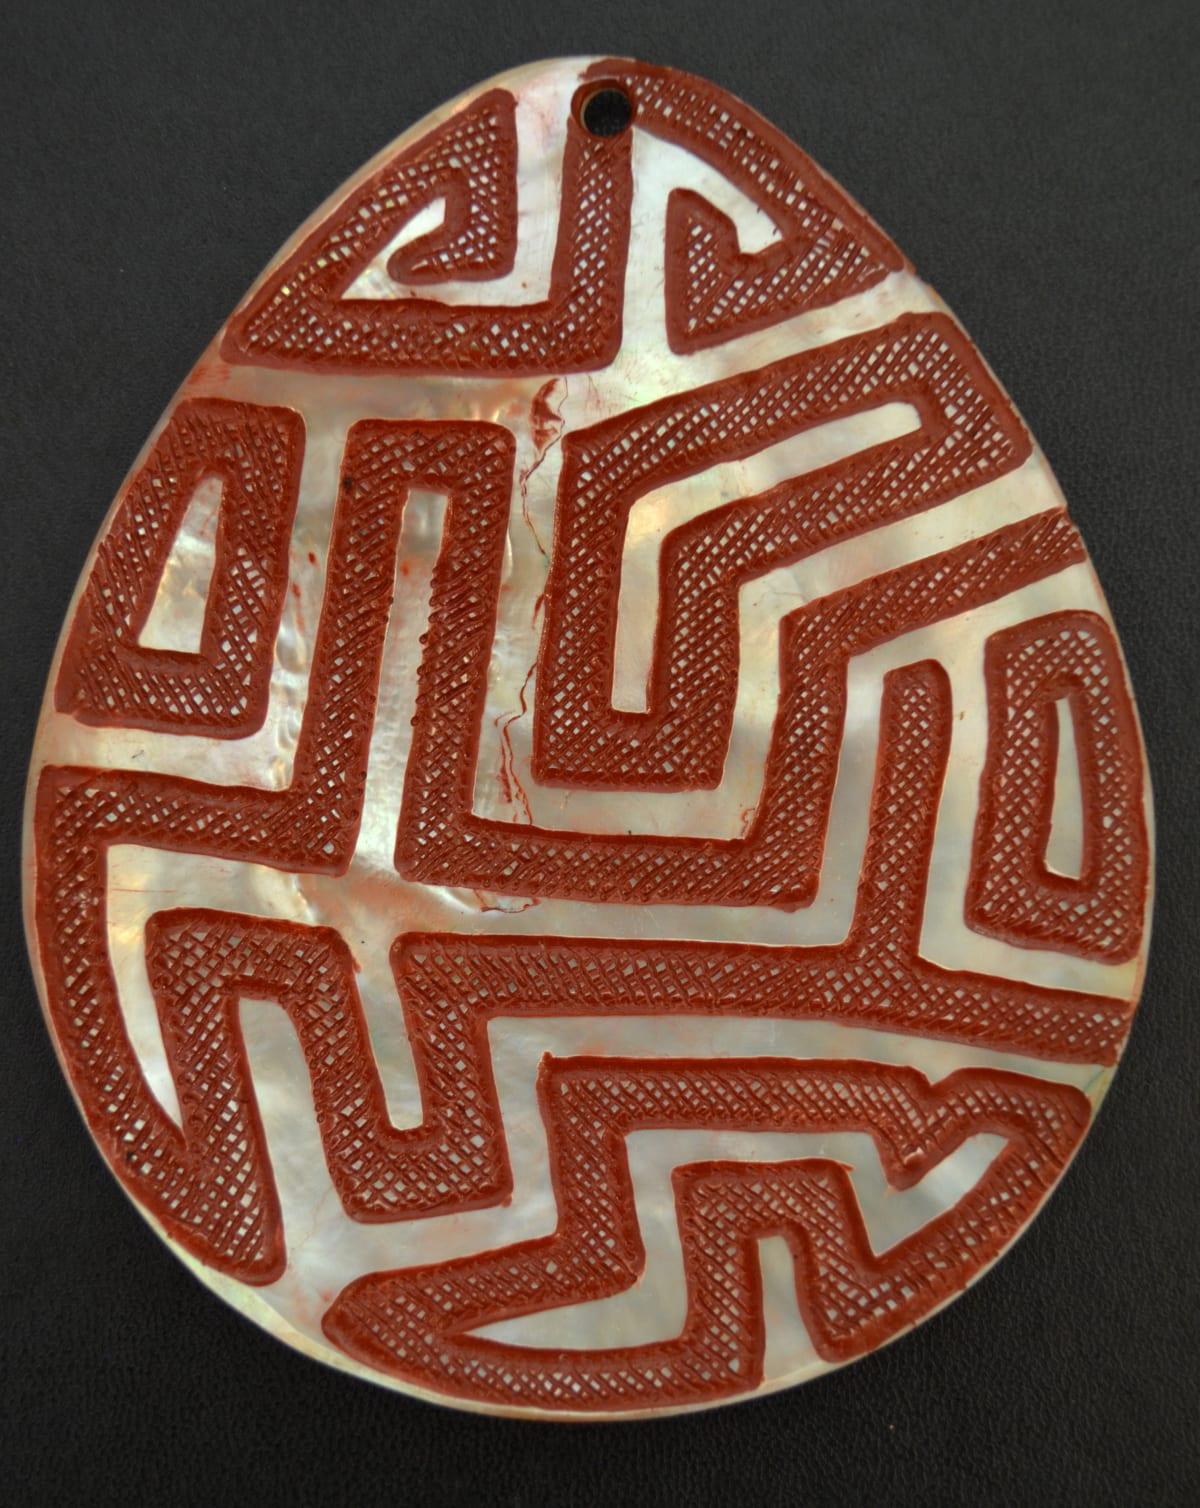 Sebastian Arrow Untitled carved pearl shell & red ochre 13.5 x 11 cm